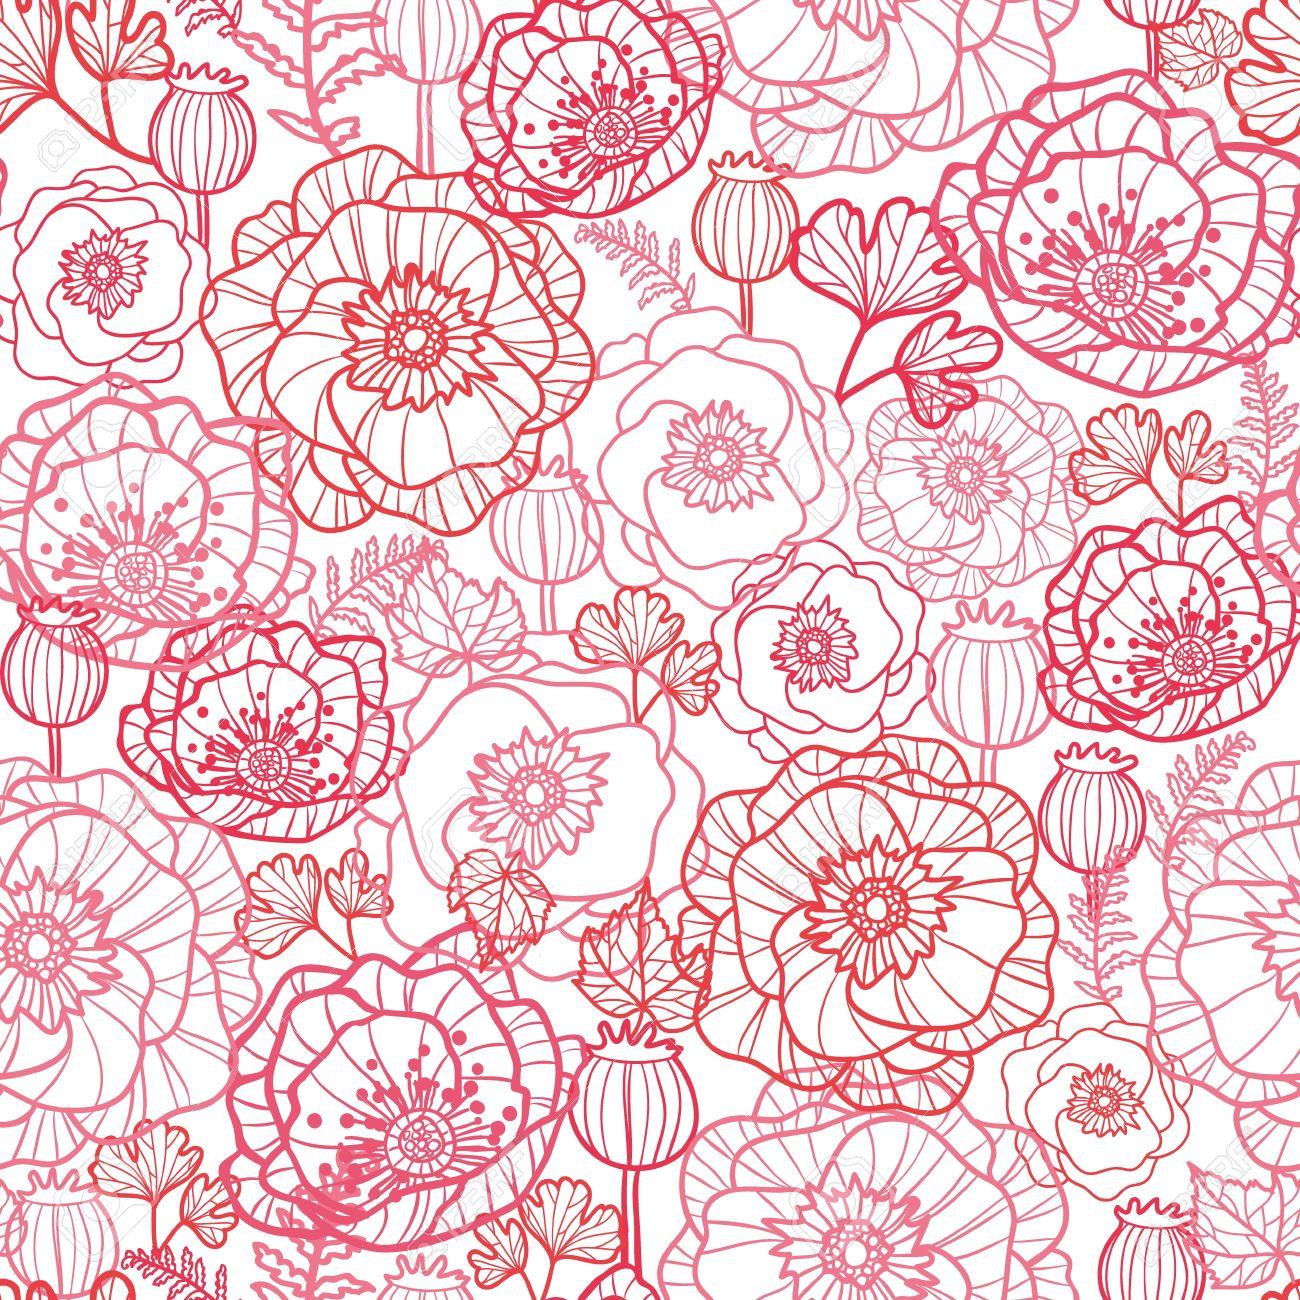 Poppy flowers line art seamless pattern background Stock Vector - 16583055